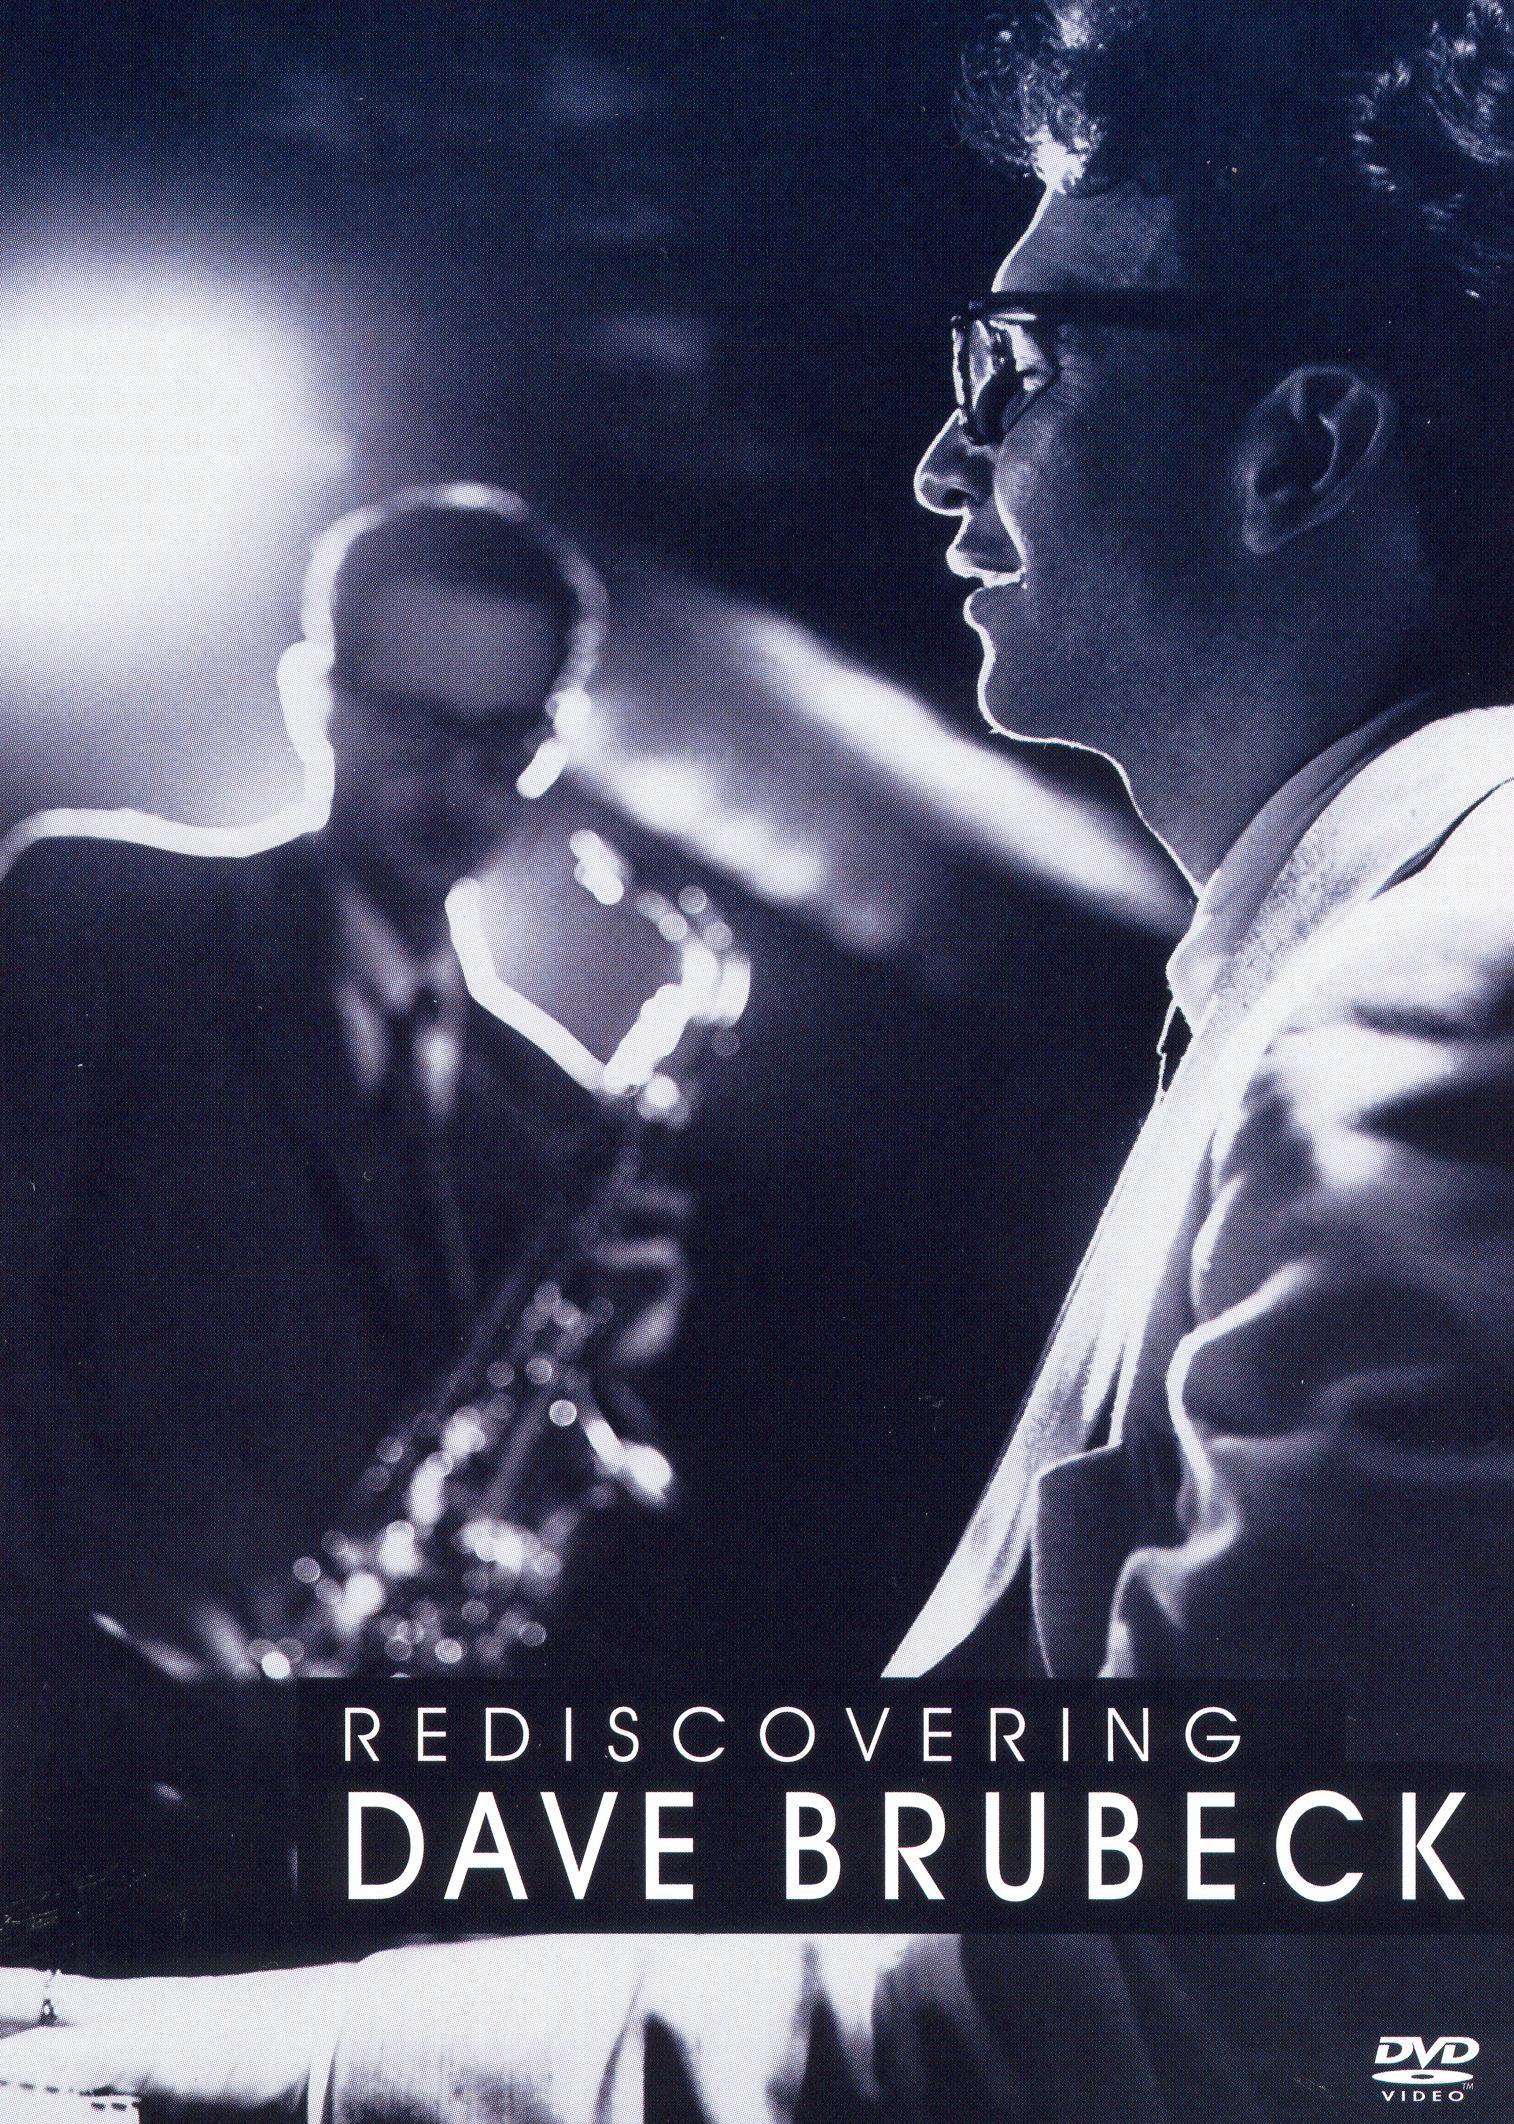 Dave Brubeck: Rediscovering Dave Brubeck